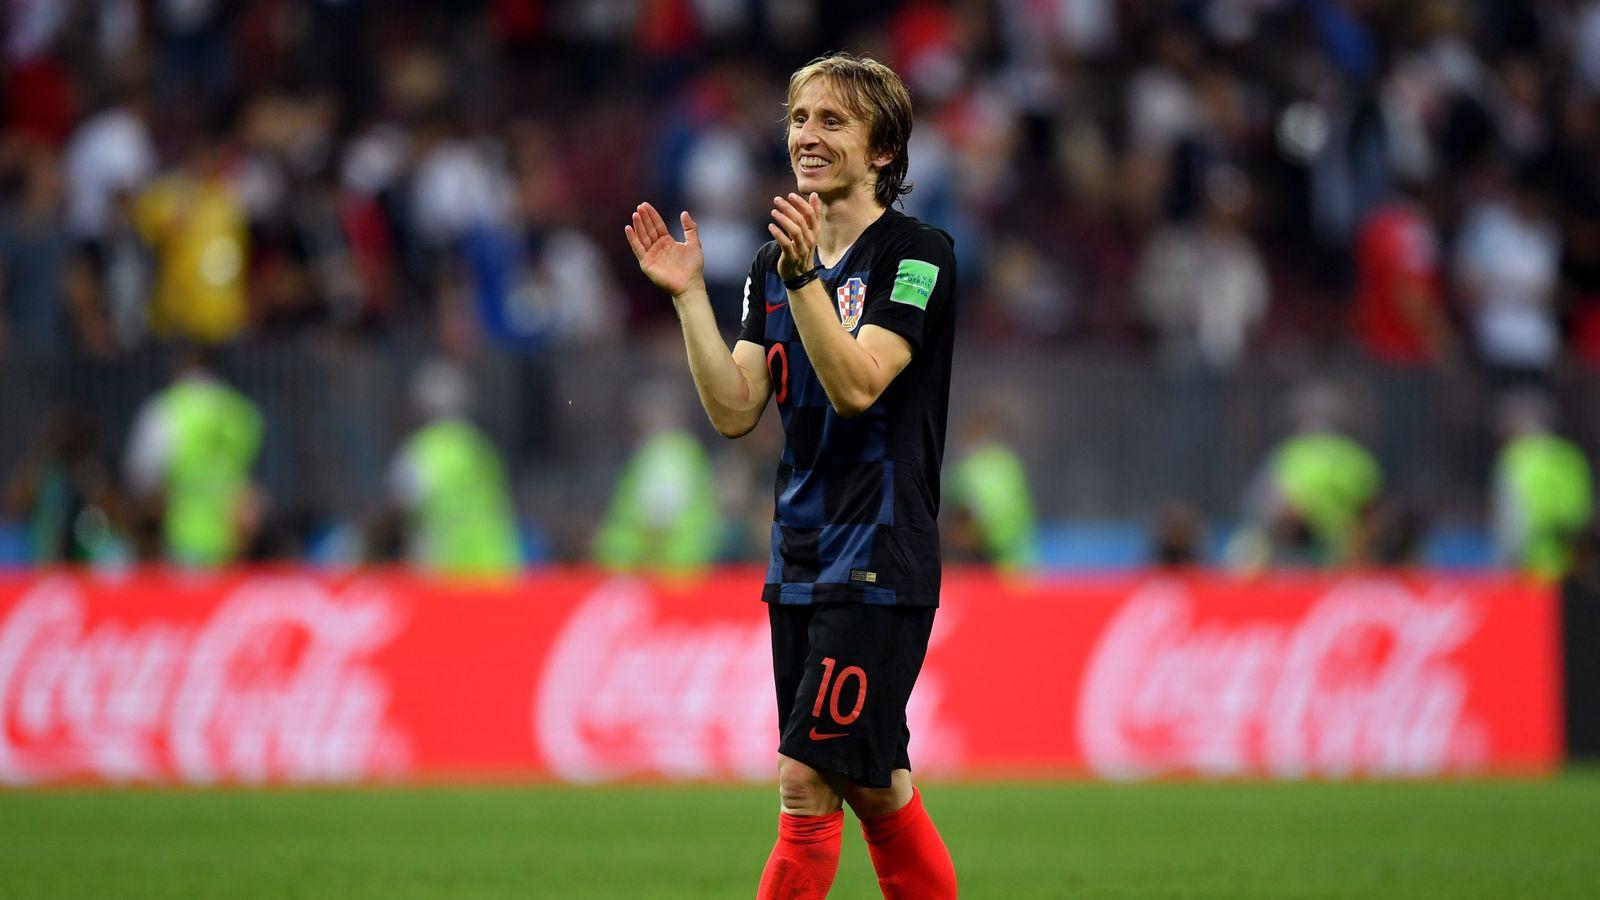 Luka Modric says English media underestimated Croatia